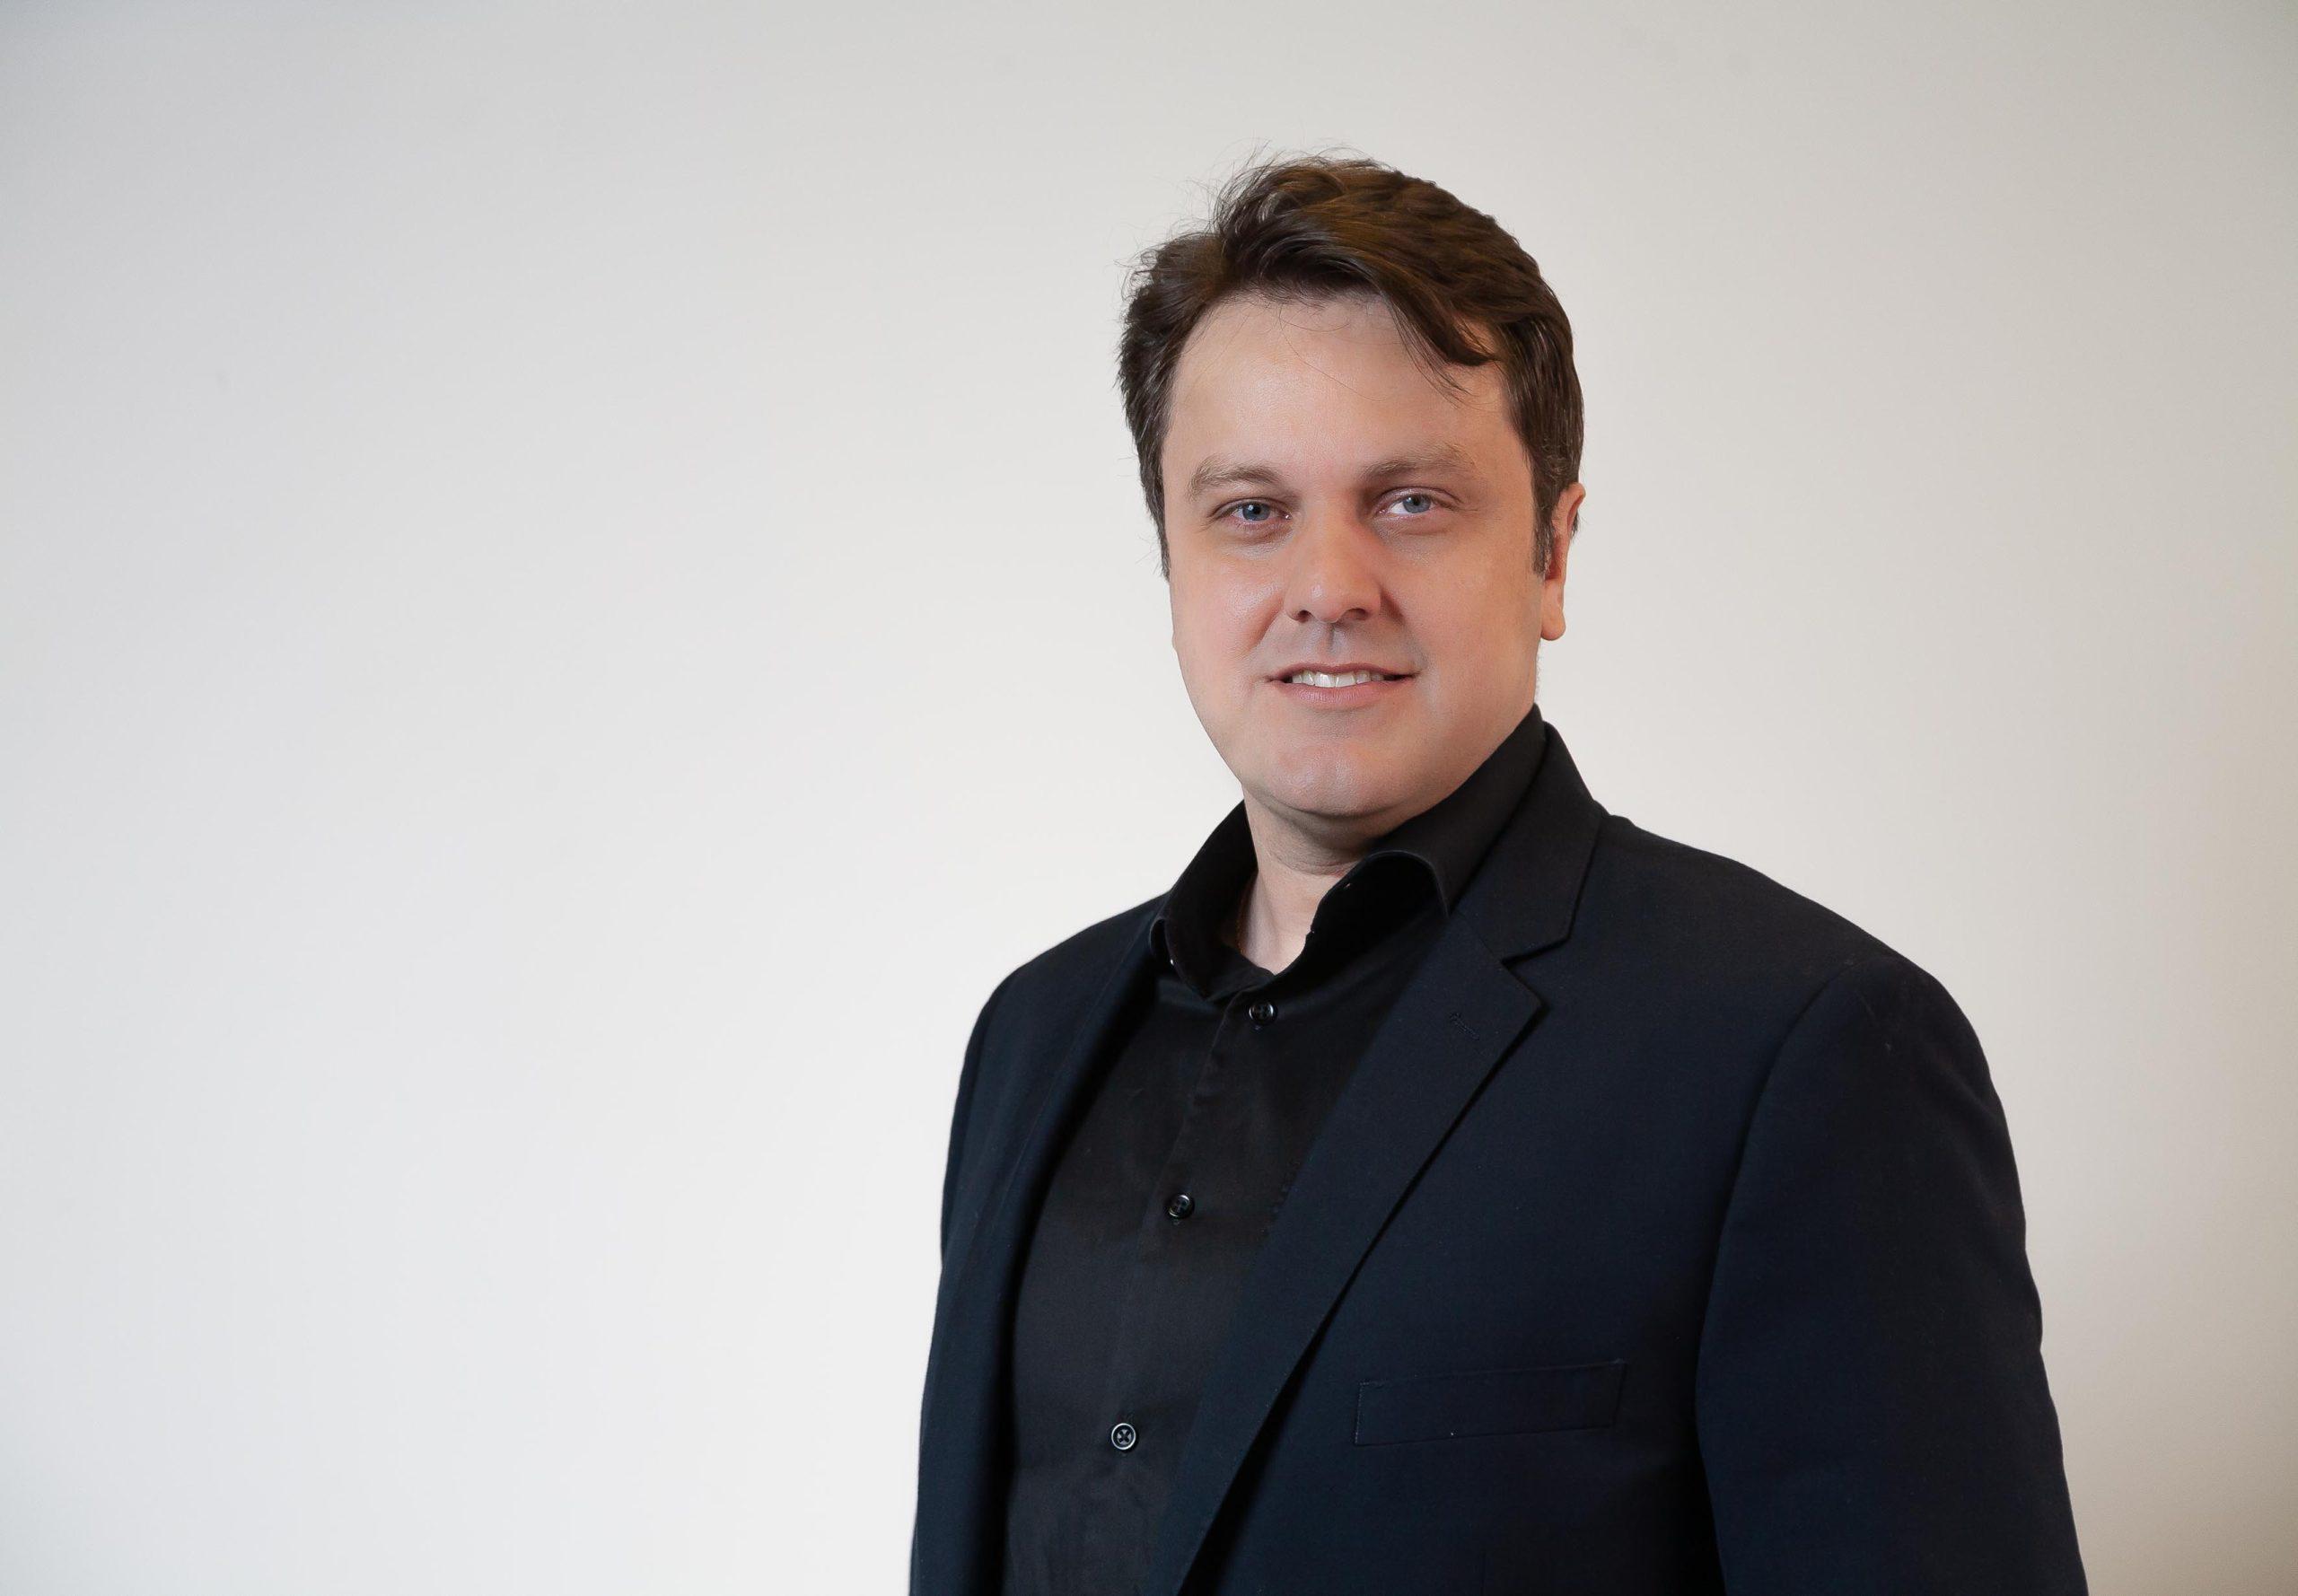 Digital banks invisíveis: modelo promete revolucionar mercado – Rodrigo Pimenta